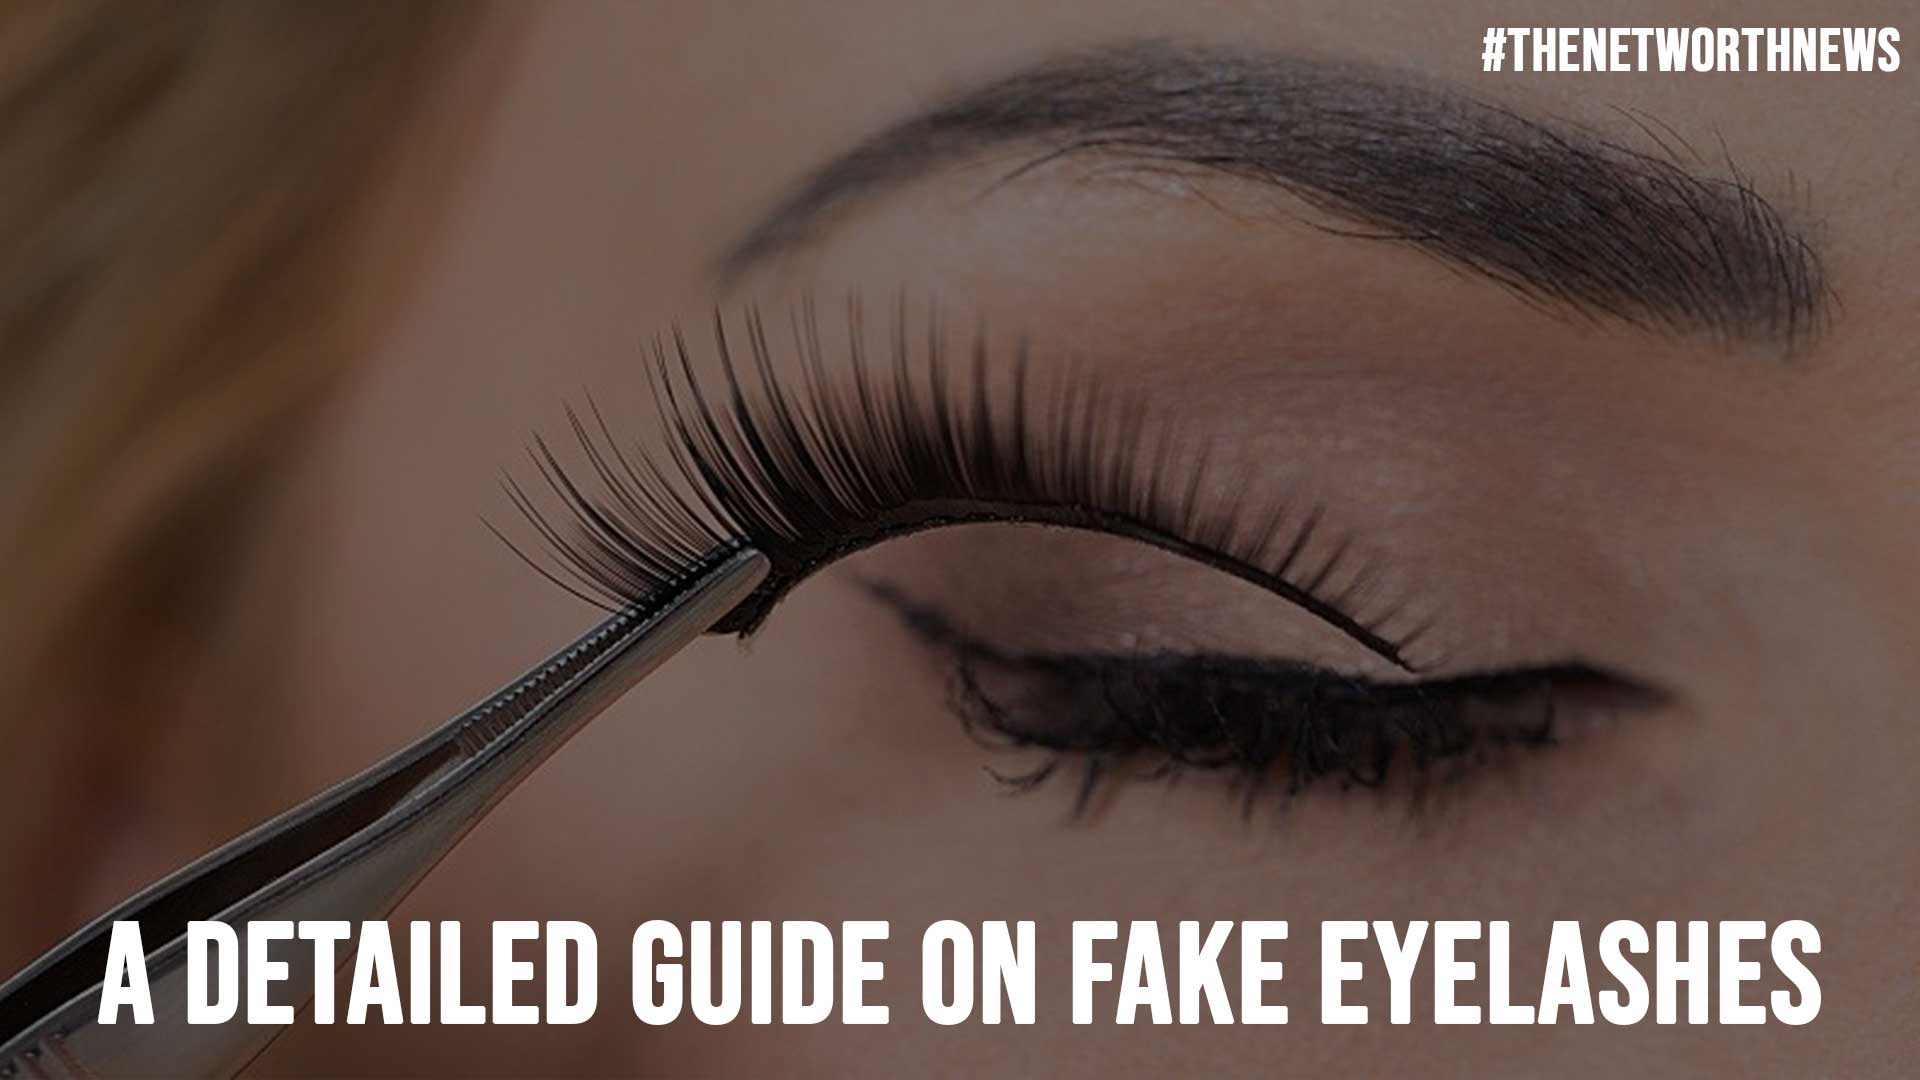 A Detailed Guide on Fake Eyelashes